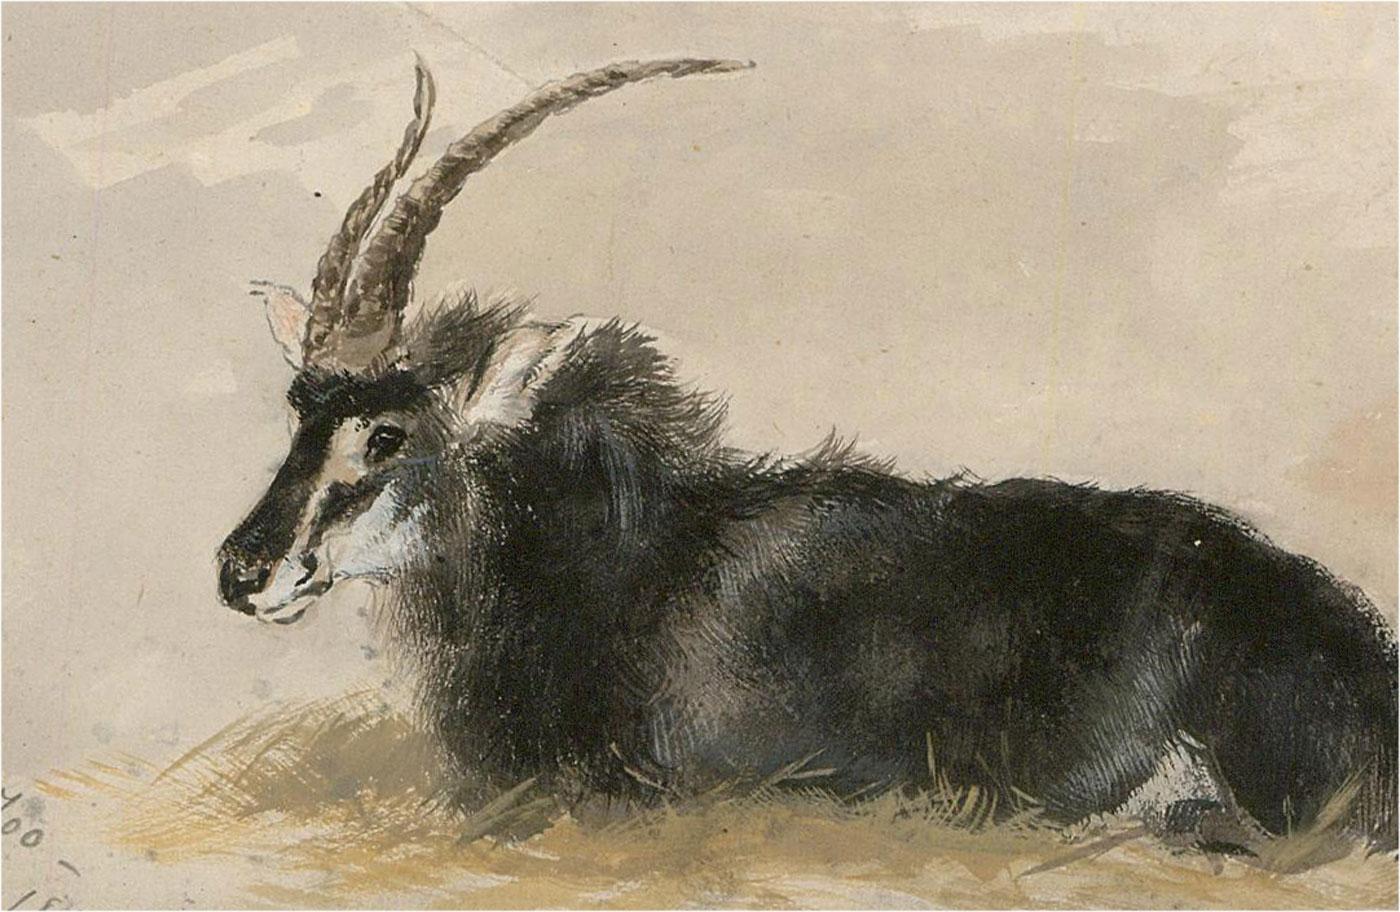 1880 Watercolour - Sable Antelope